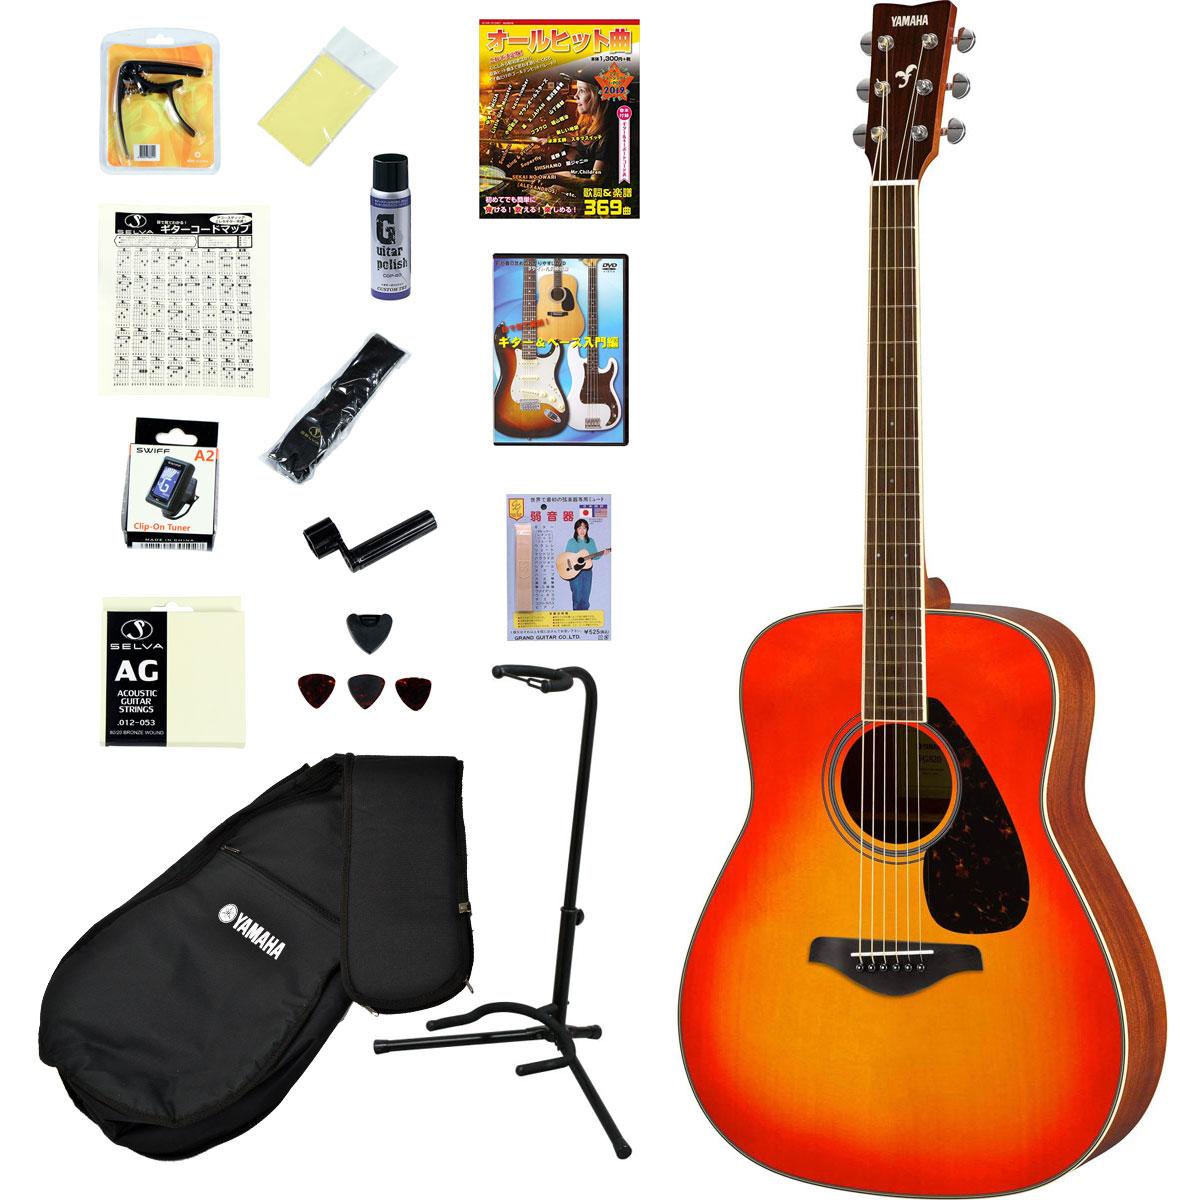 YAMAHA / FG820 AB(オータムバースト) 【オールヒット曲歌本17点入門セット】【楽譜が付いたお買い得セット】 ヤマハ アコースティックギター アコギ FG-820 入門 初心者【YRK】